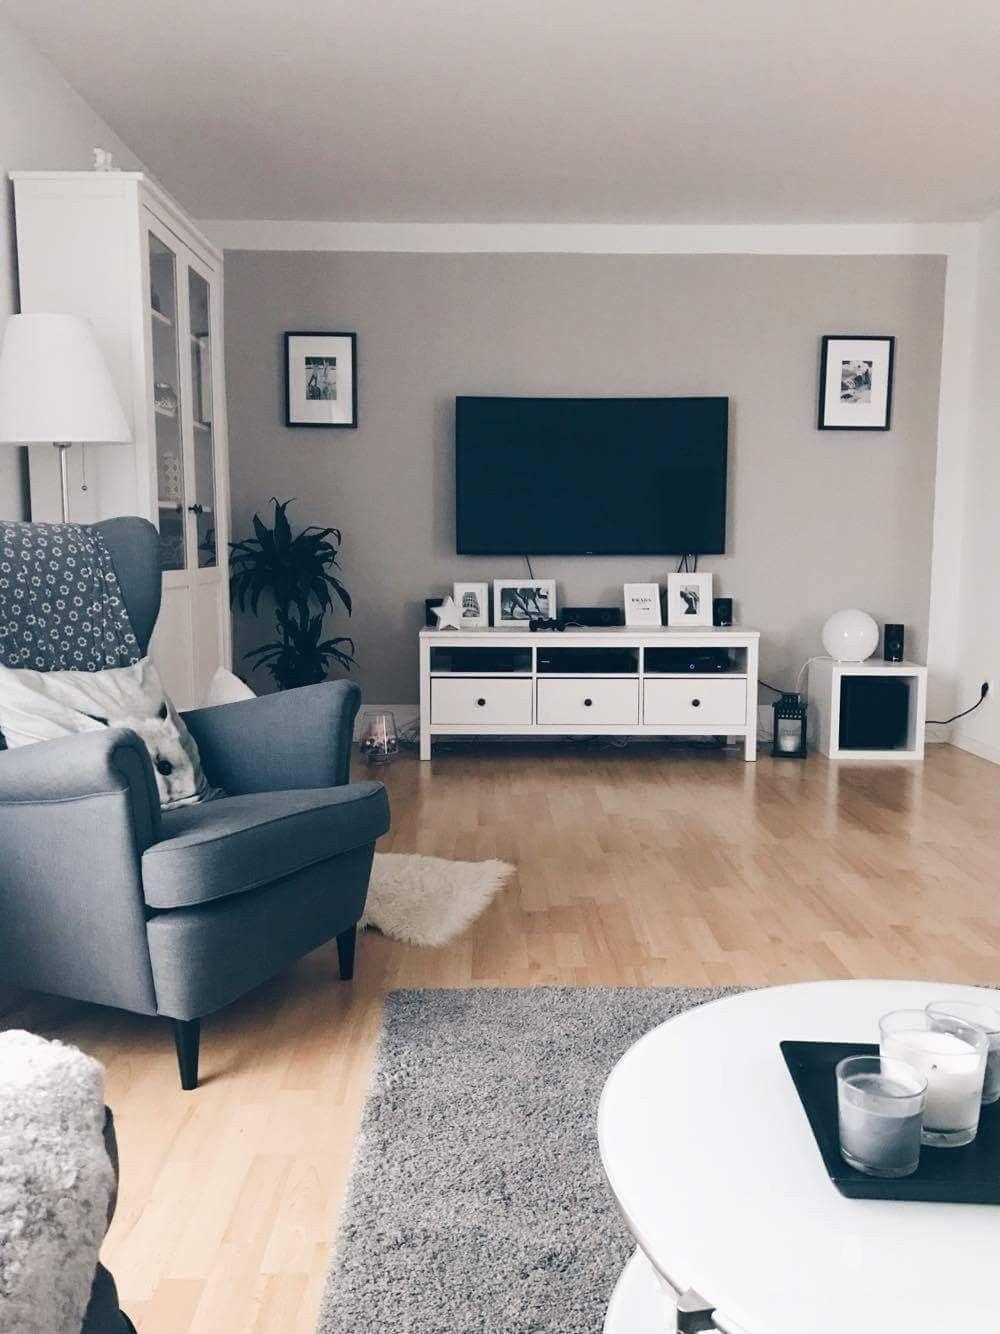 Living Room Tv Setups: Like Tv Setup With Blk/wht Pics